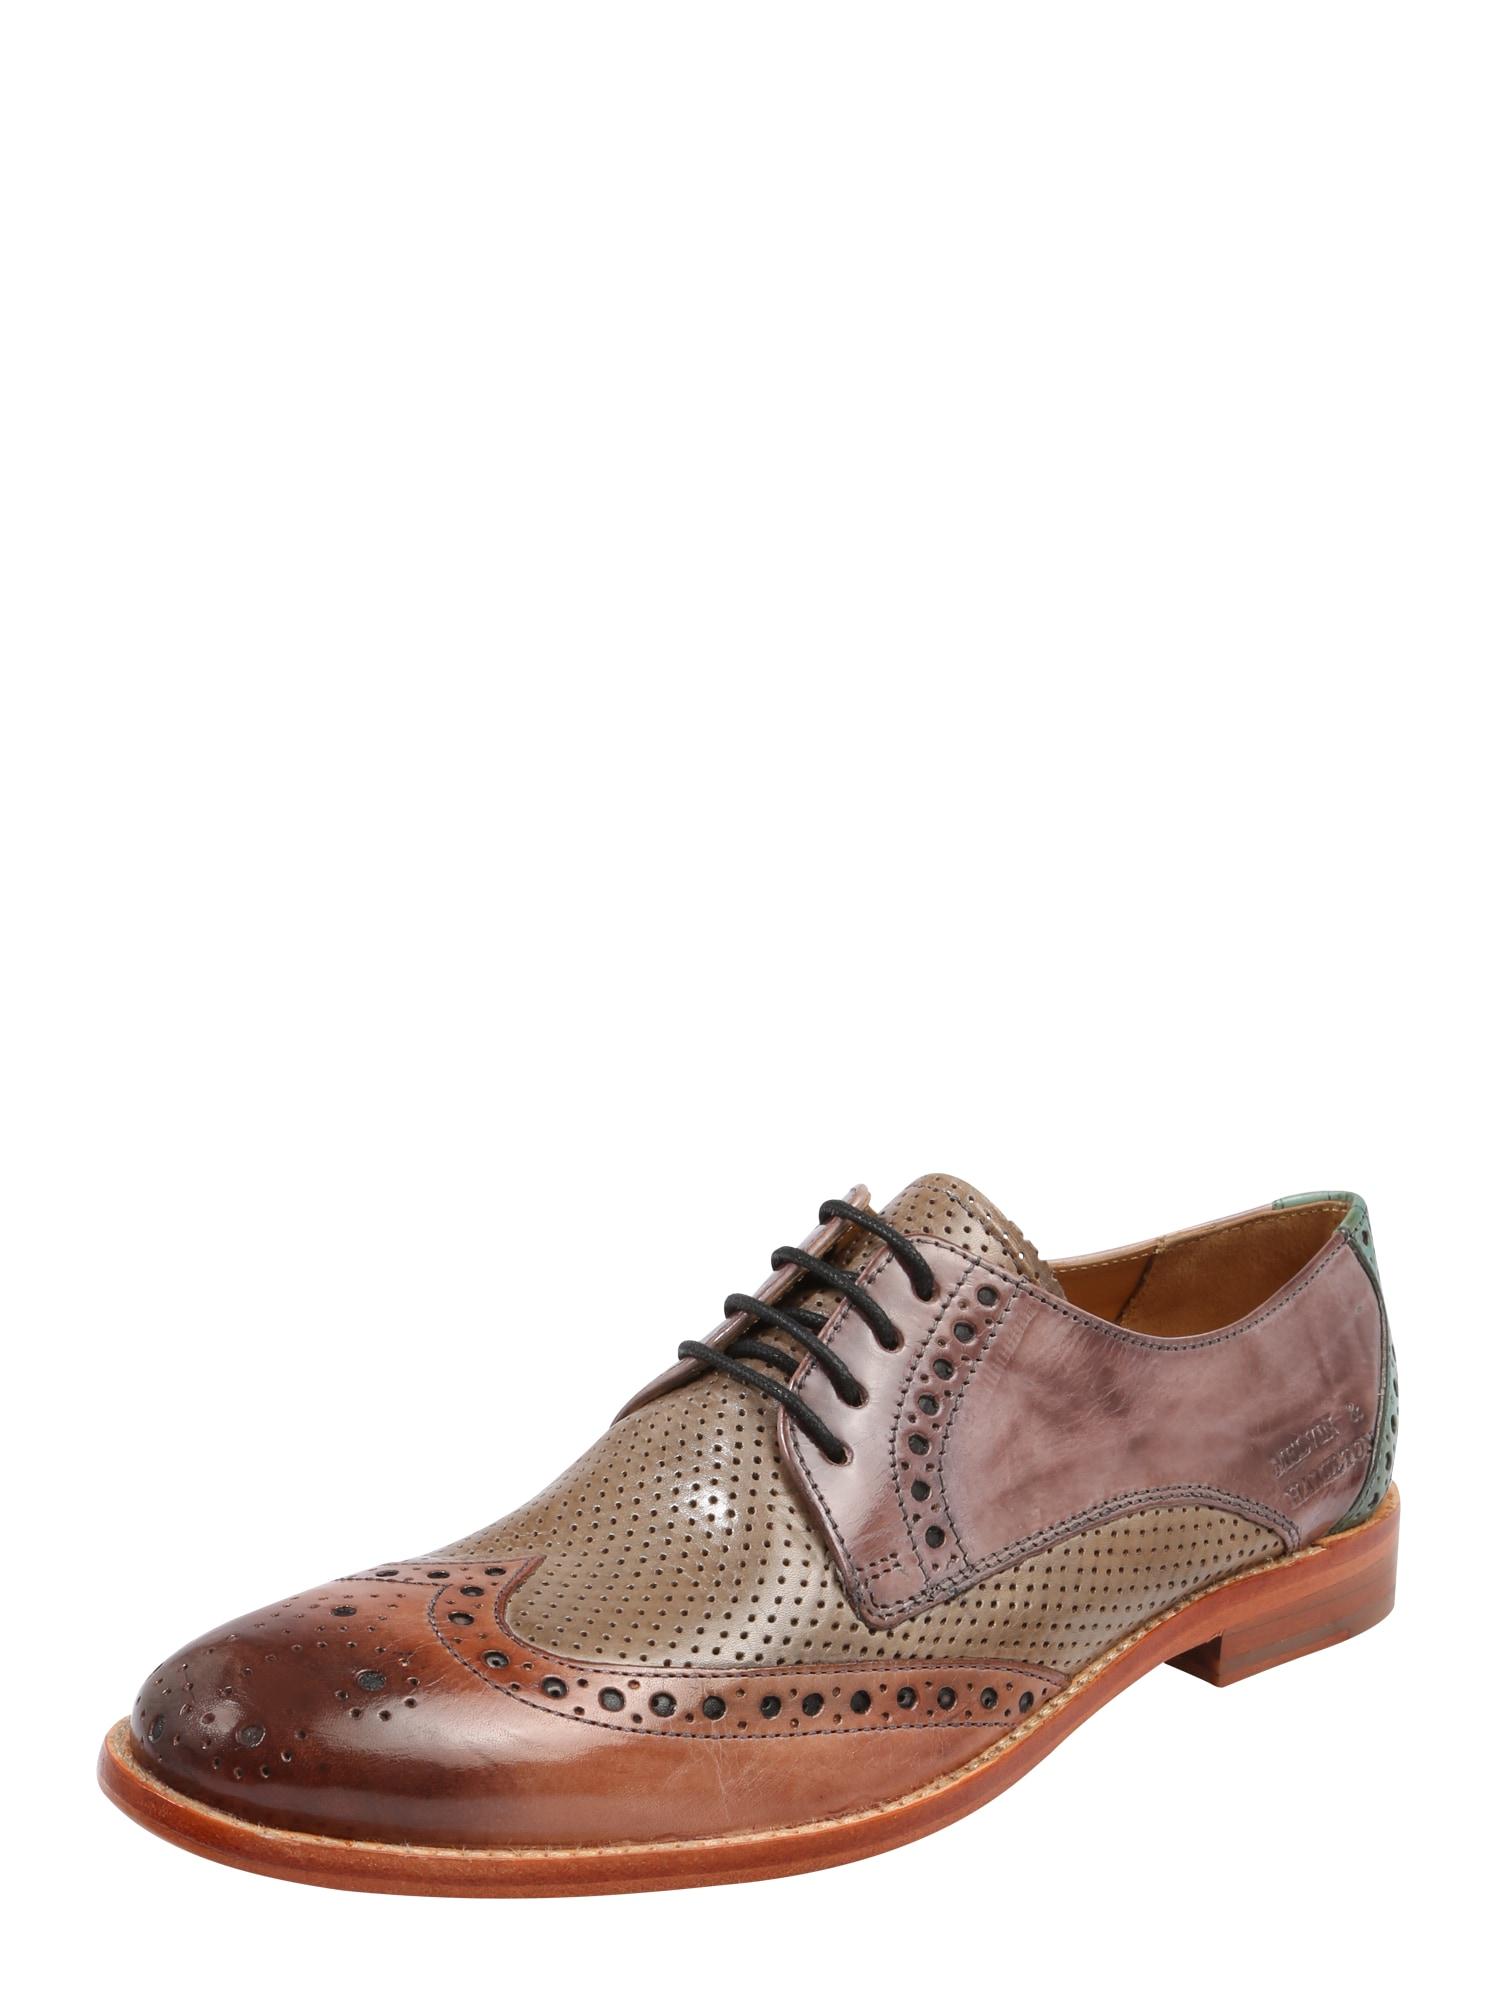 Šněrovací boty Amelie 3 hnědá smaragdová MELVIN & HAMILTON